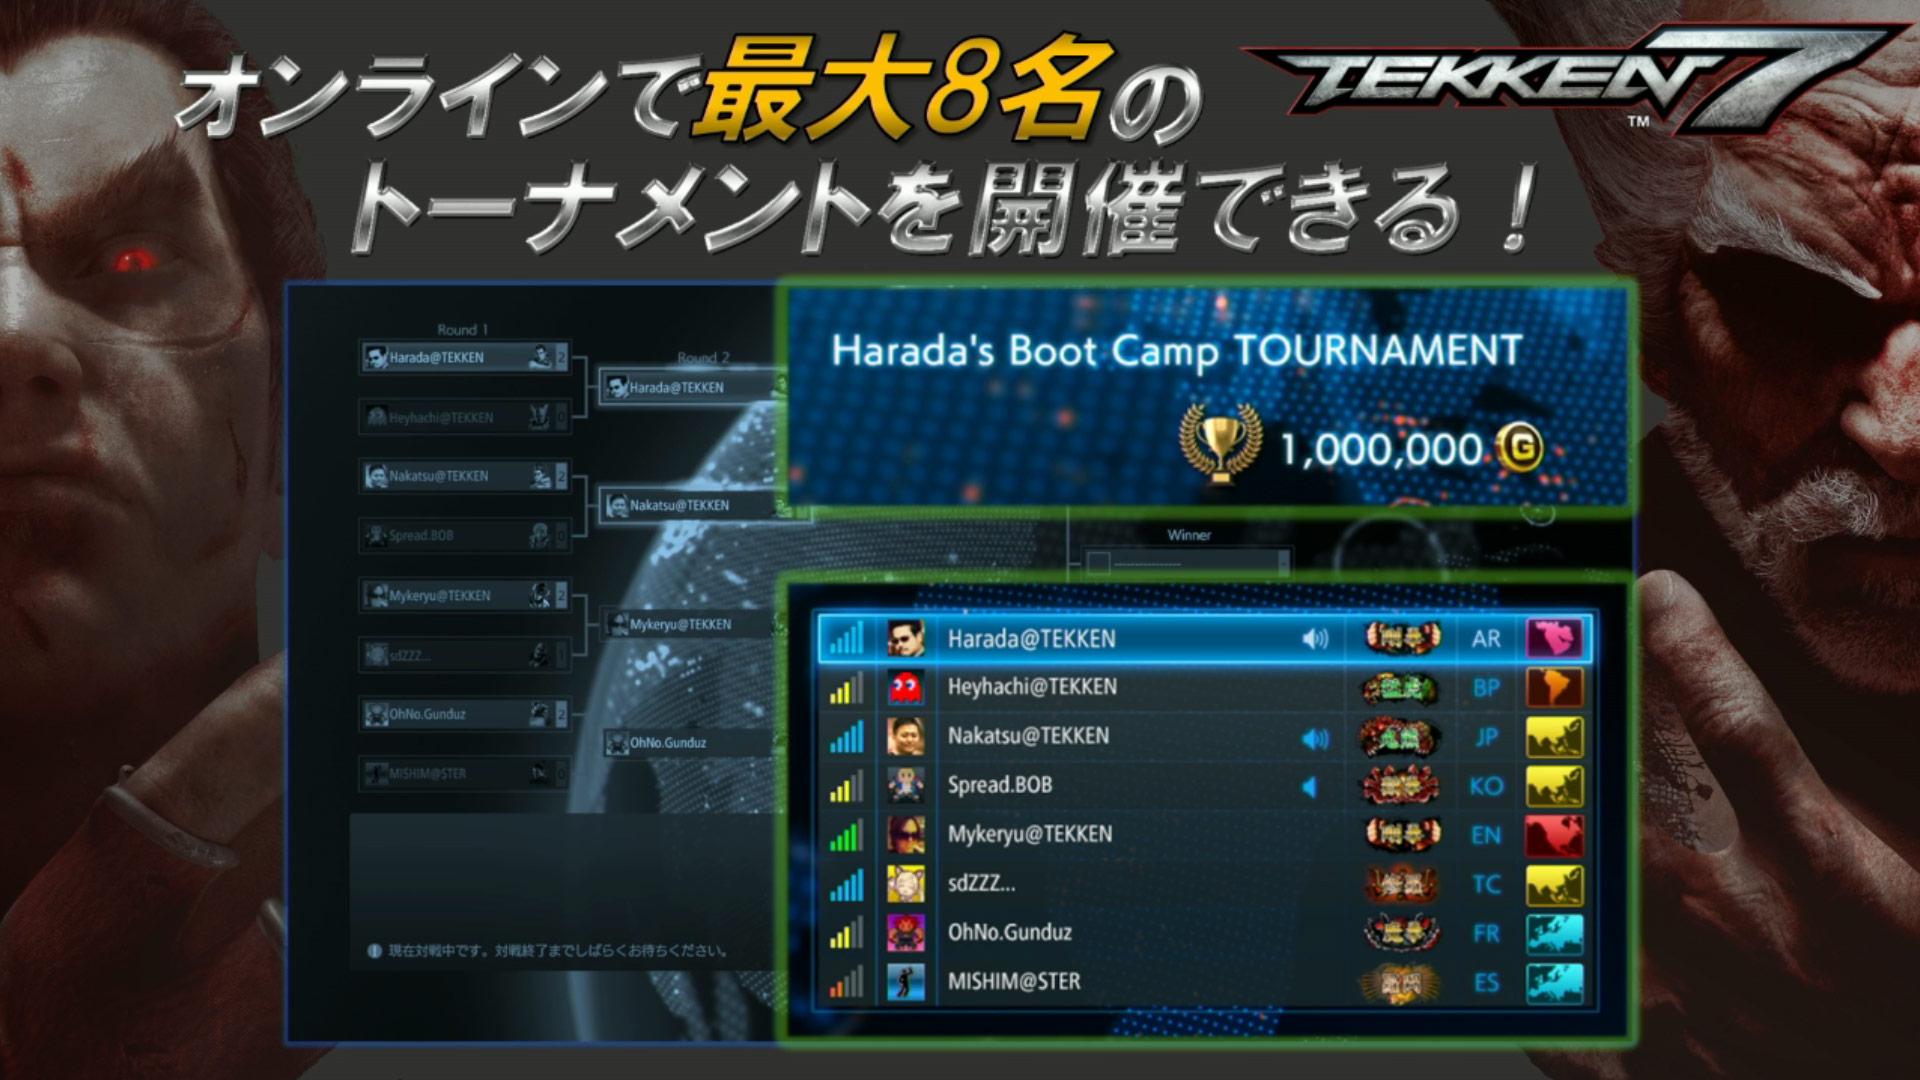 Tekken 7: Fated Retribution Kuma & Panda Reveal 6 out of 6 image gallery